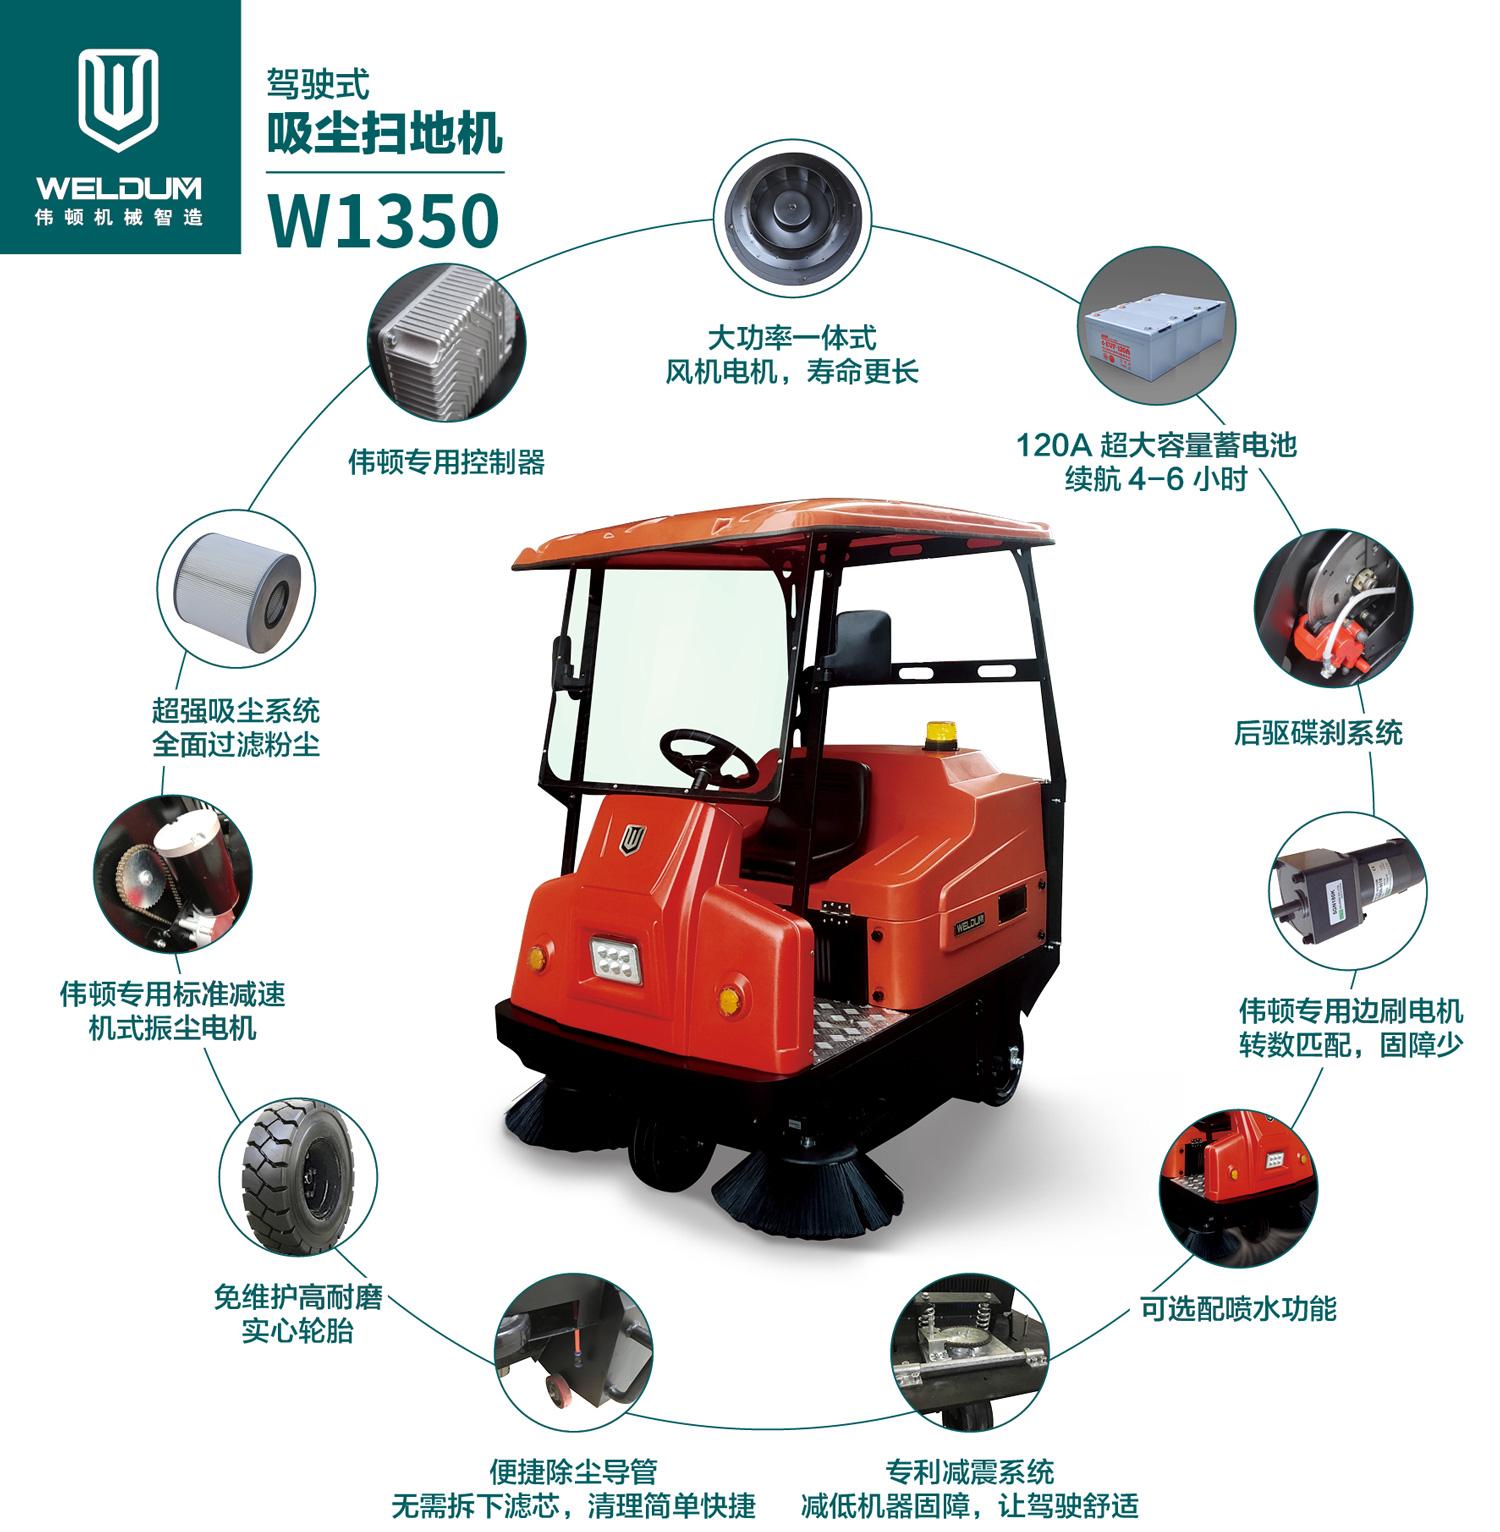 W1350(租赁)正面